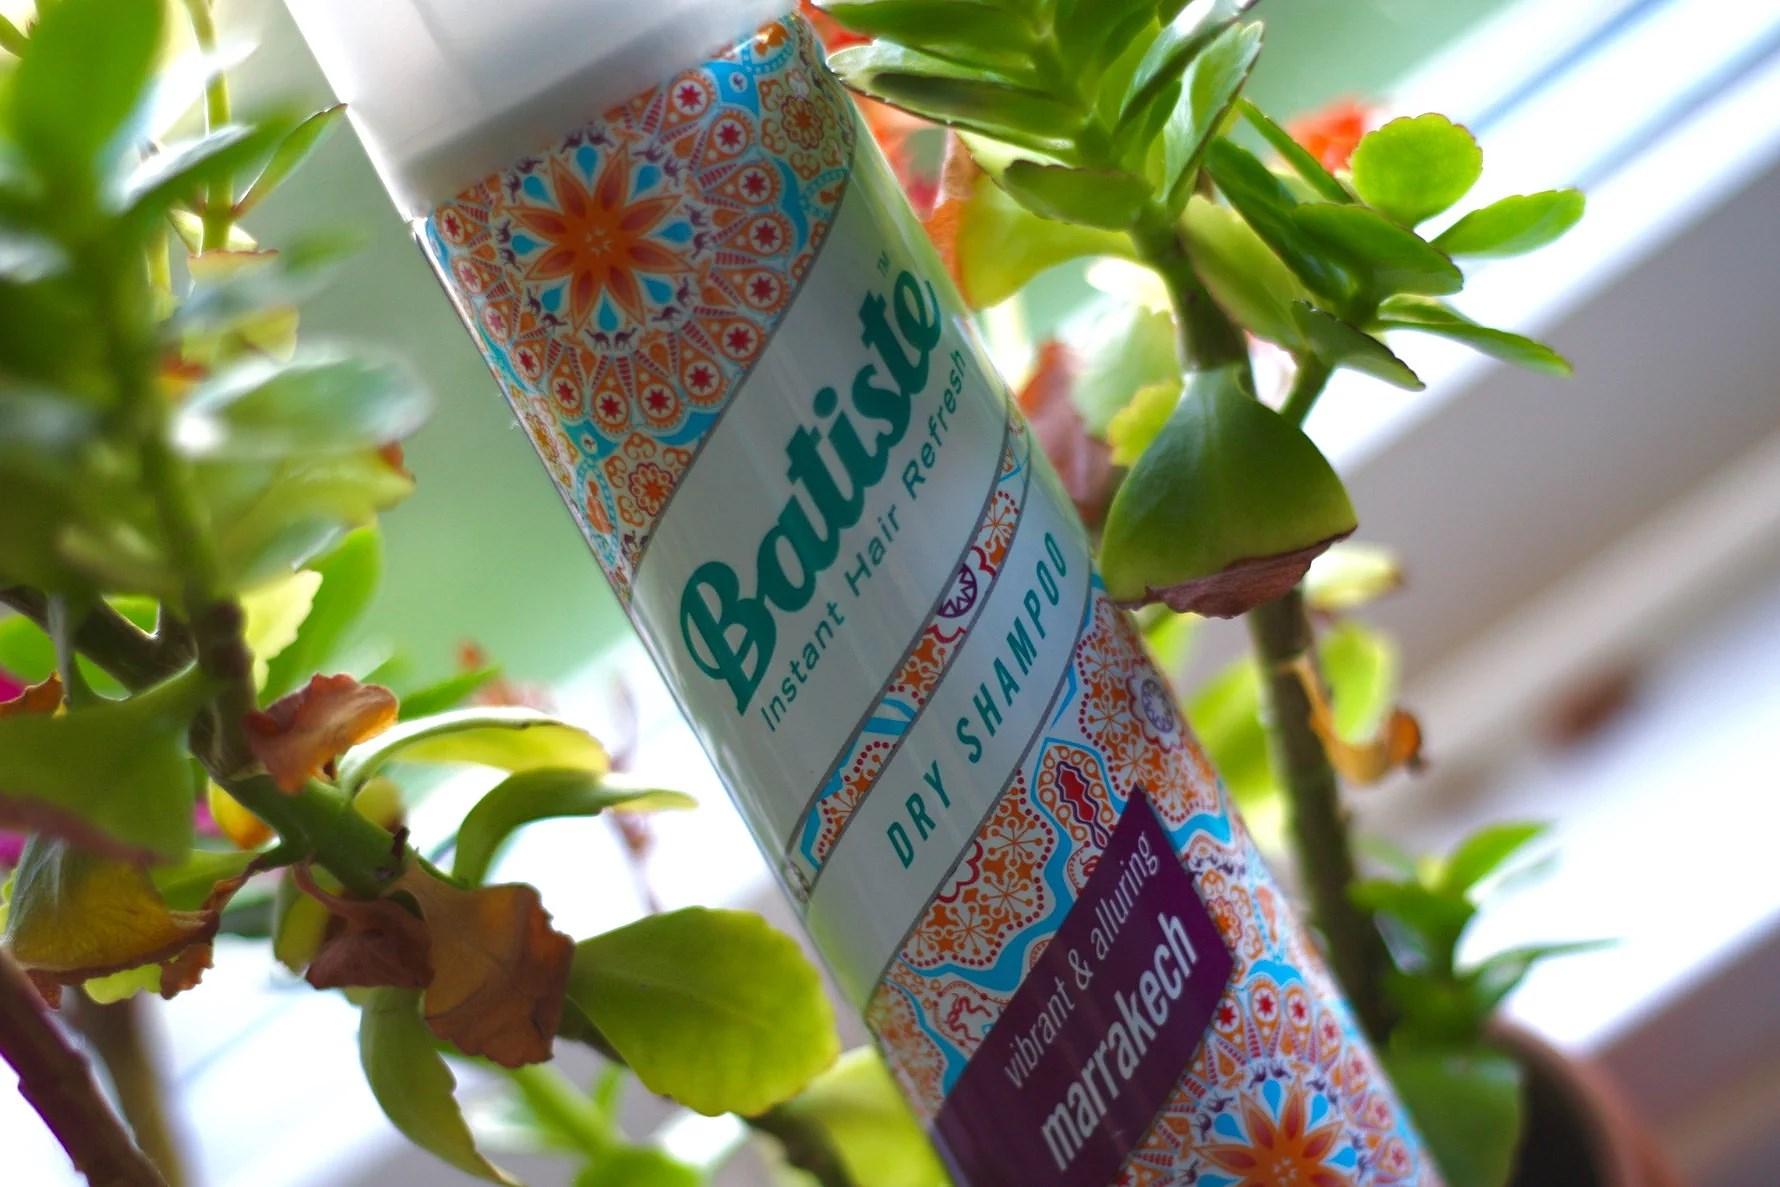 Marrakech Batiste Dry Shampoo